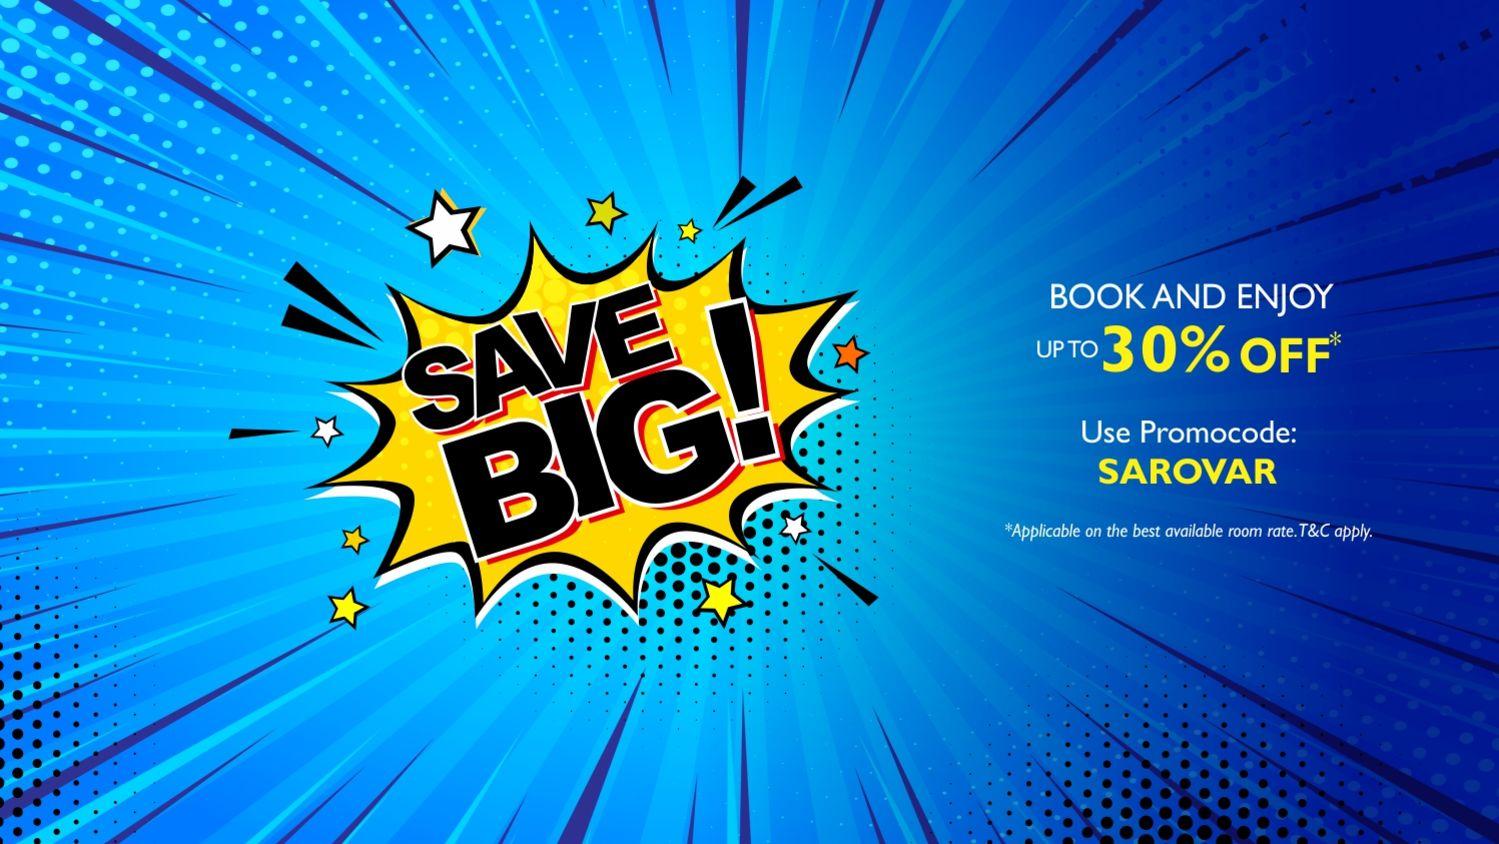 NEW Sarovar Festival-Offer-2019 Sep-2019 website